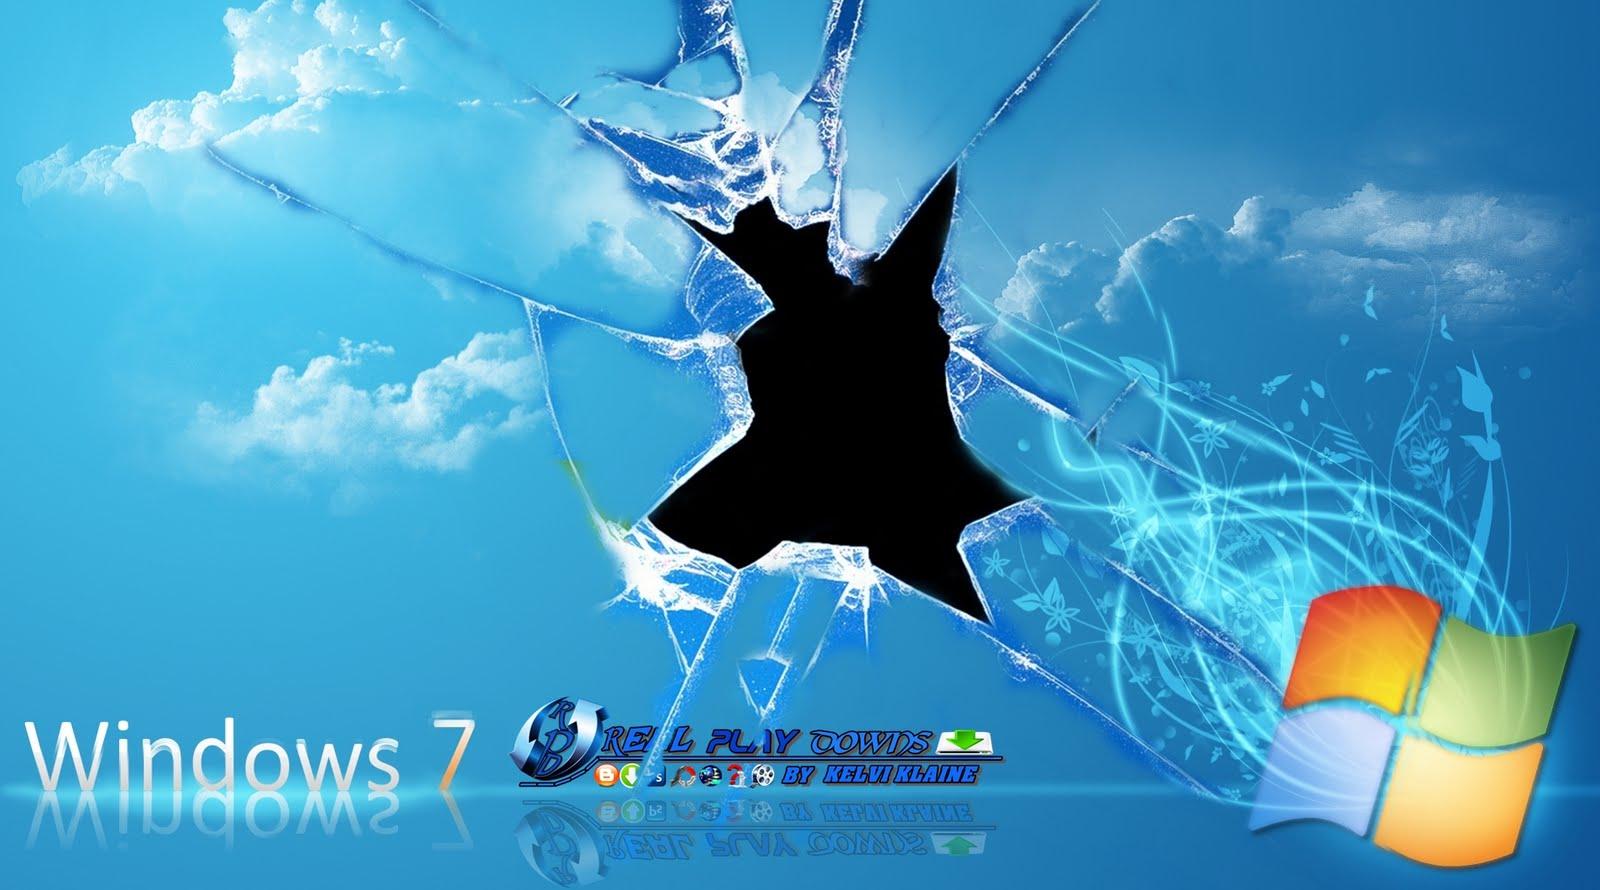 WALLPAPER Windows 7 HD QUEBRADO REAL PLAY DOWNS SUA VISITA O 1600x890